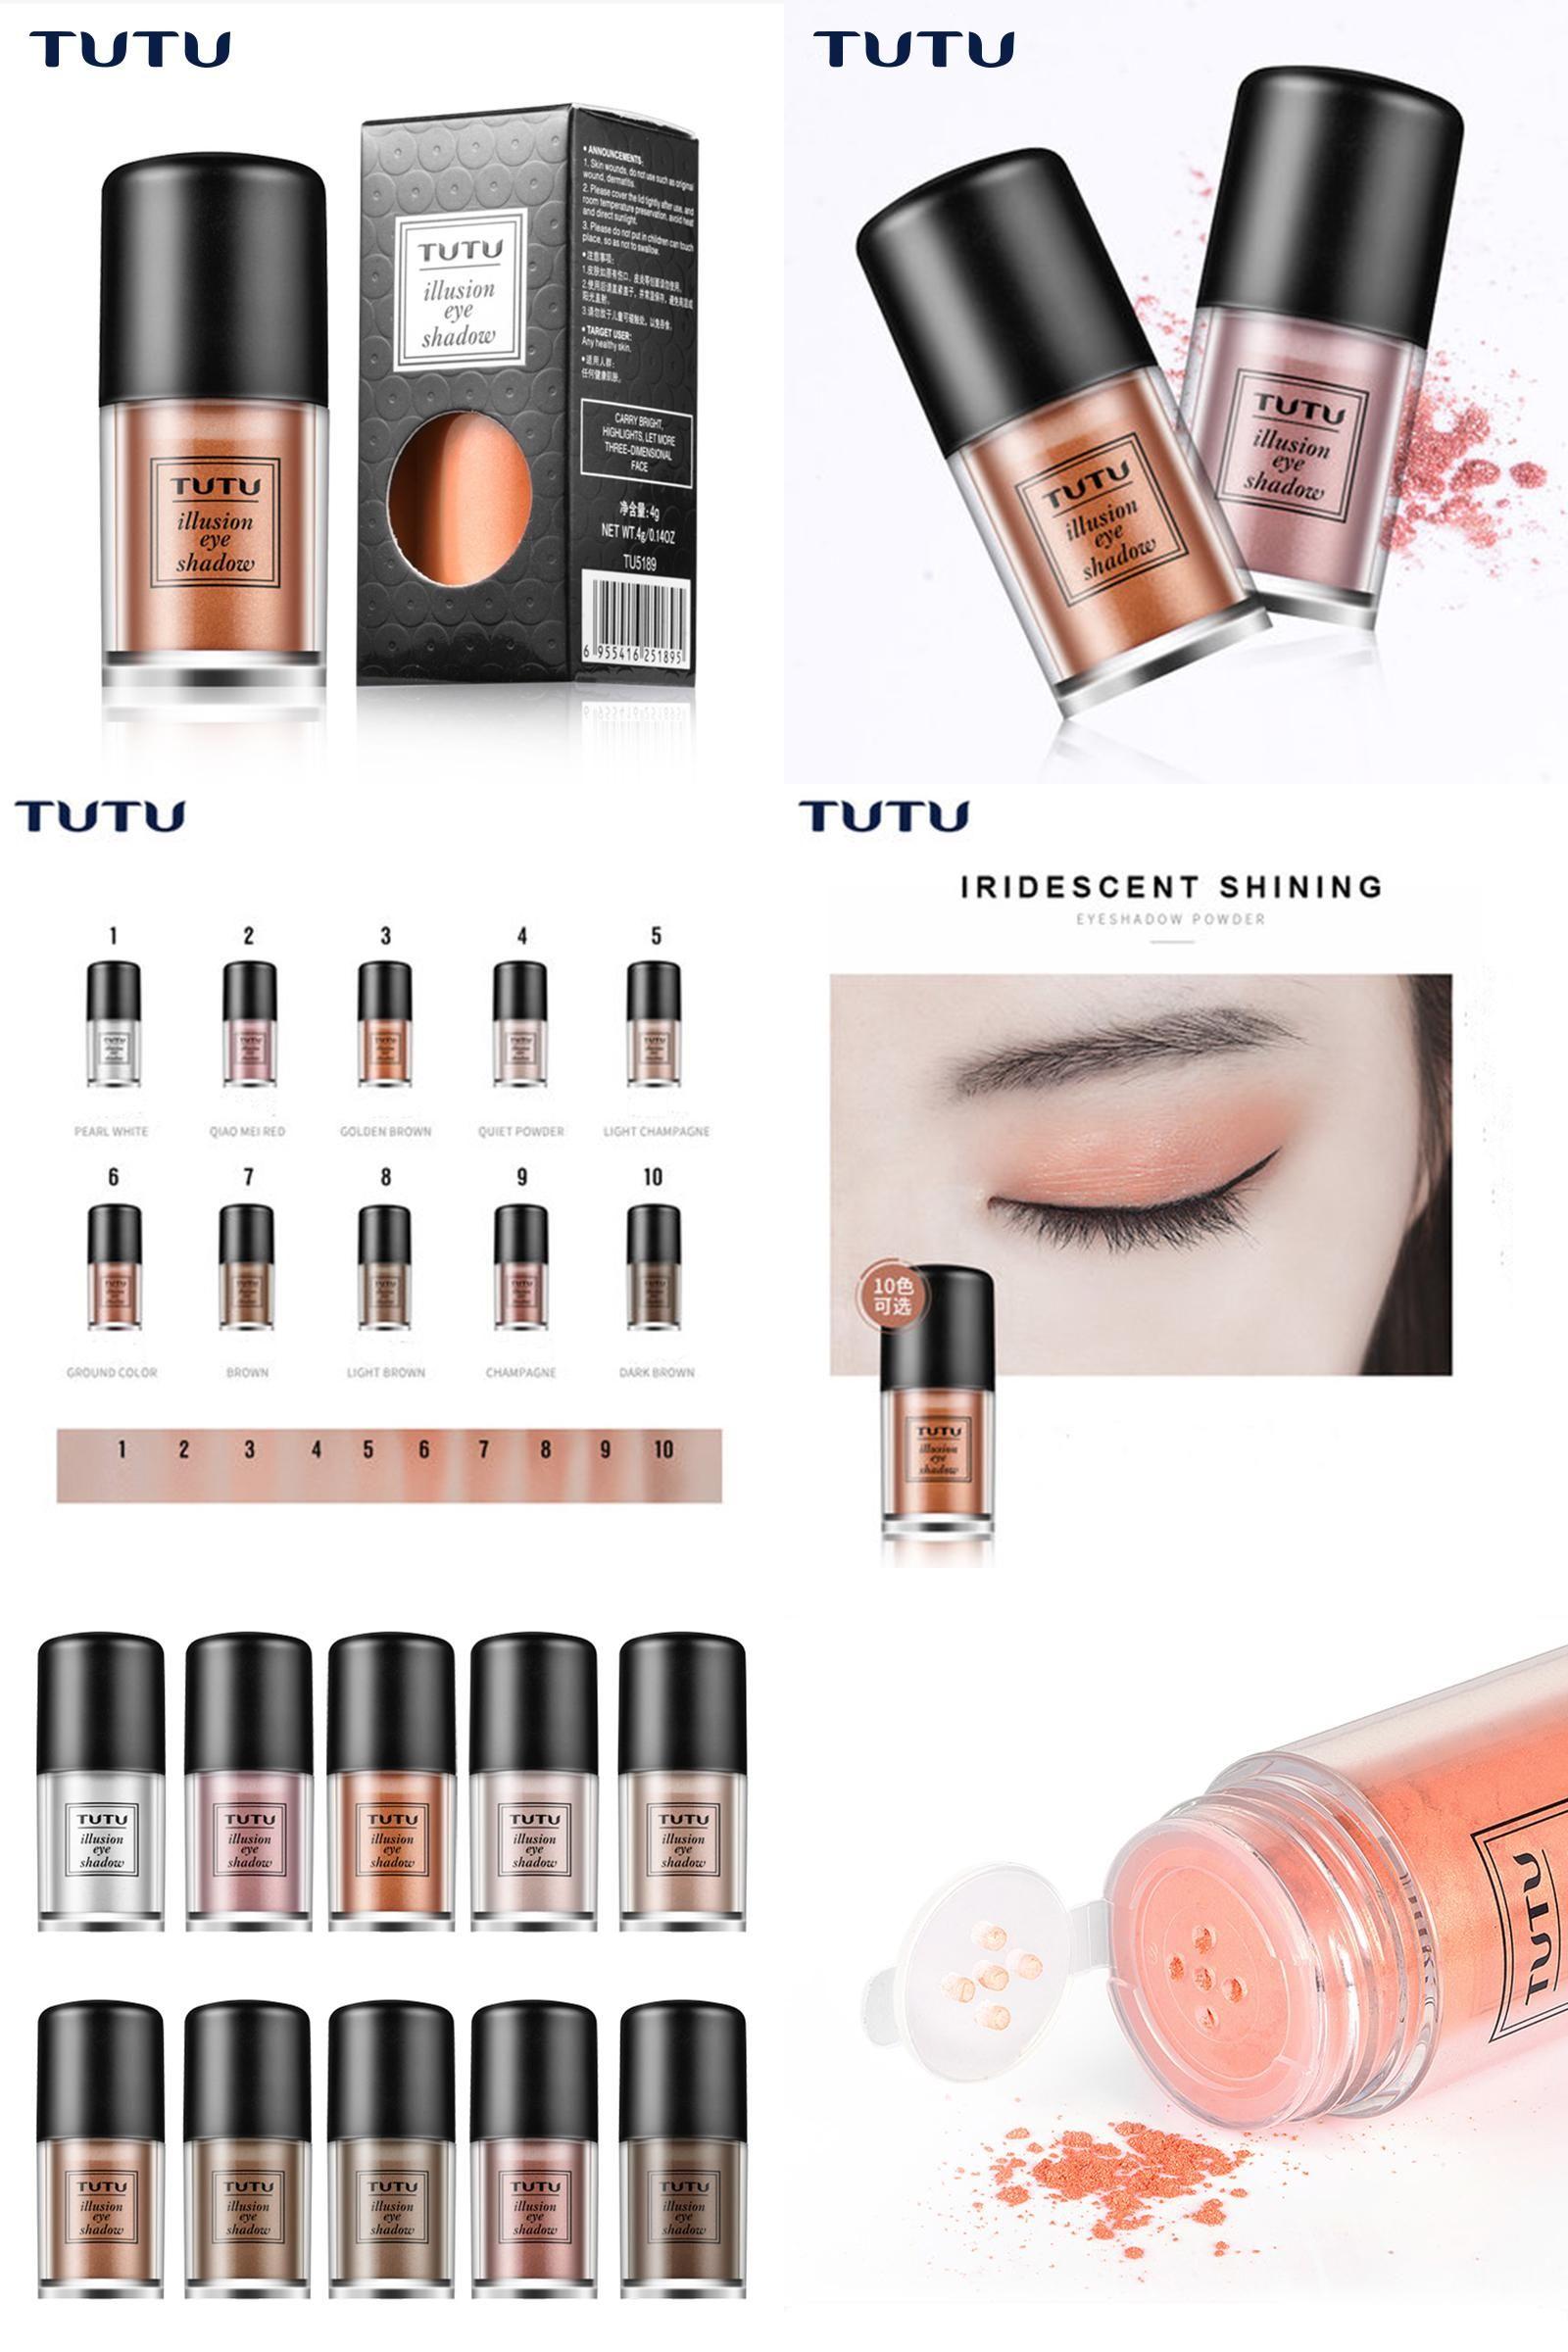 [Visit to Buy] TUTU New 10 Colors Glitter Loose Eyeshadow